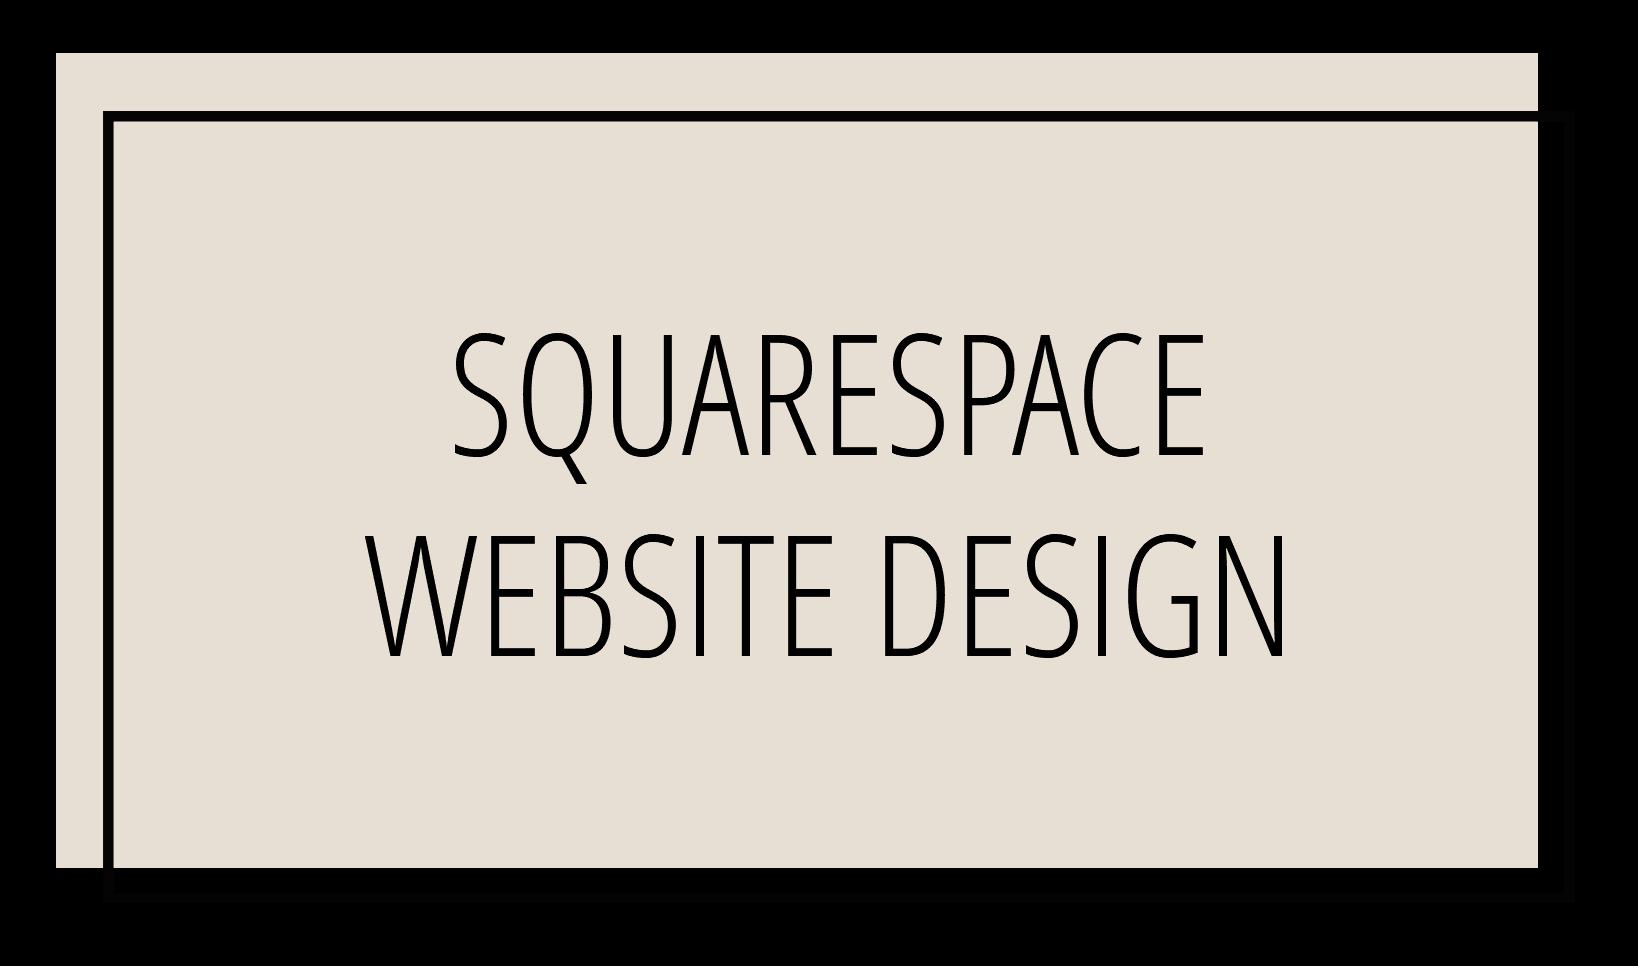 SquareSpaceWebsiteDesign.png